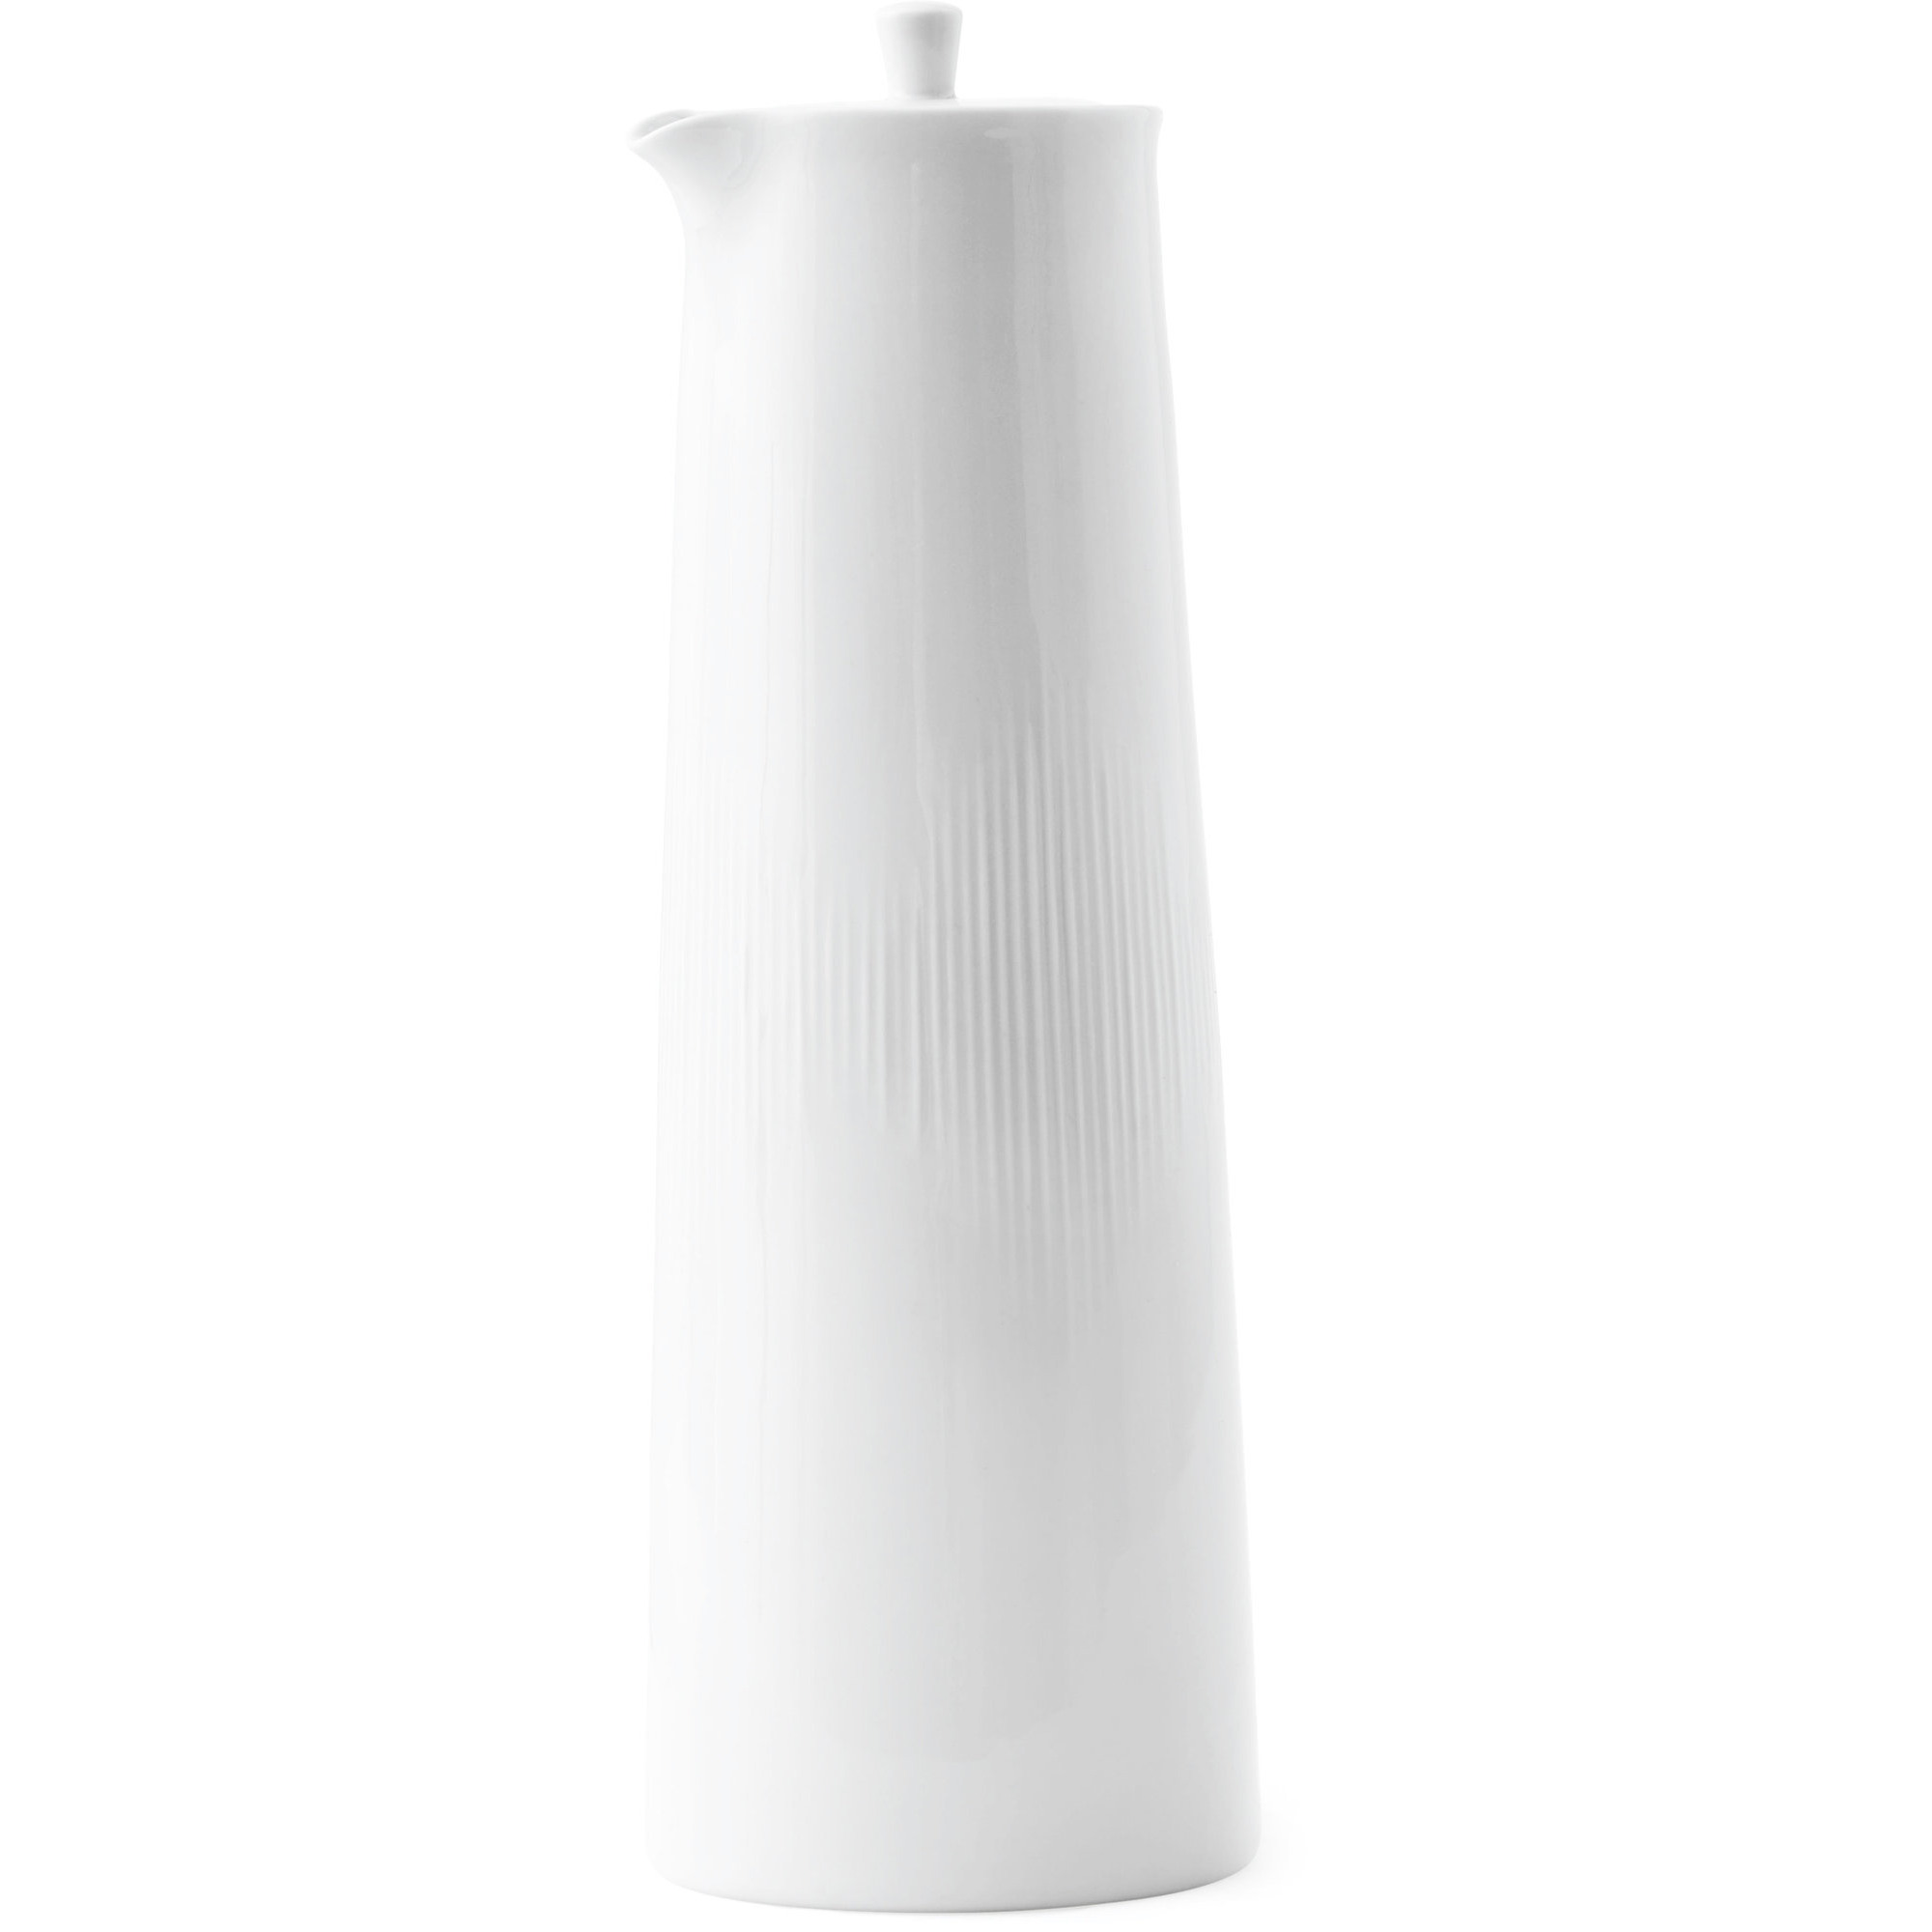 Lyngby Porcelæn Thermodan termoskanna